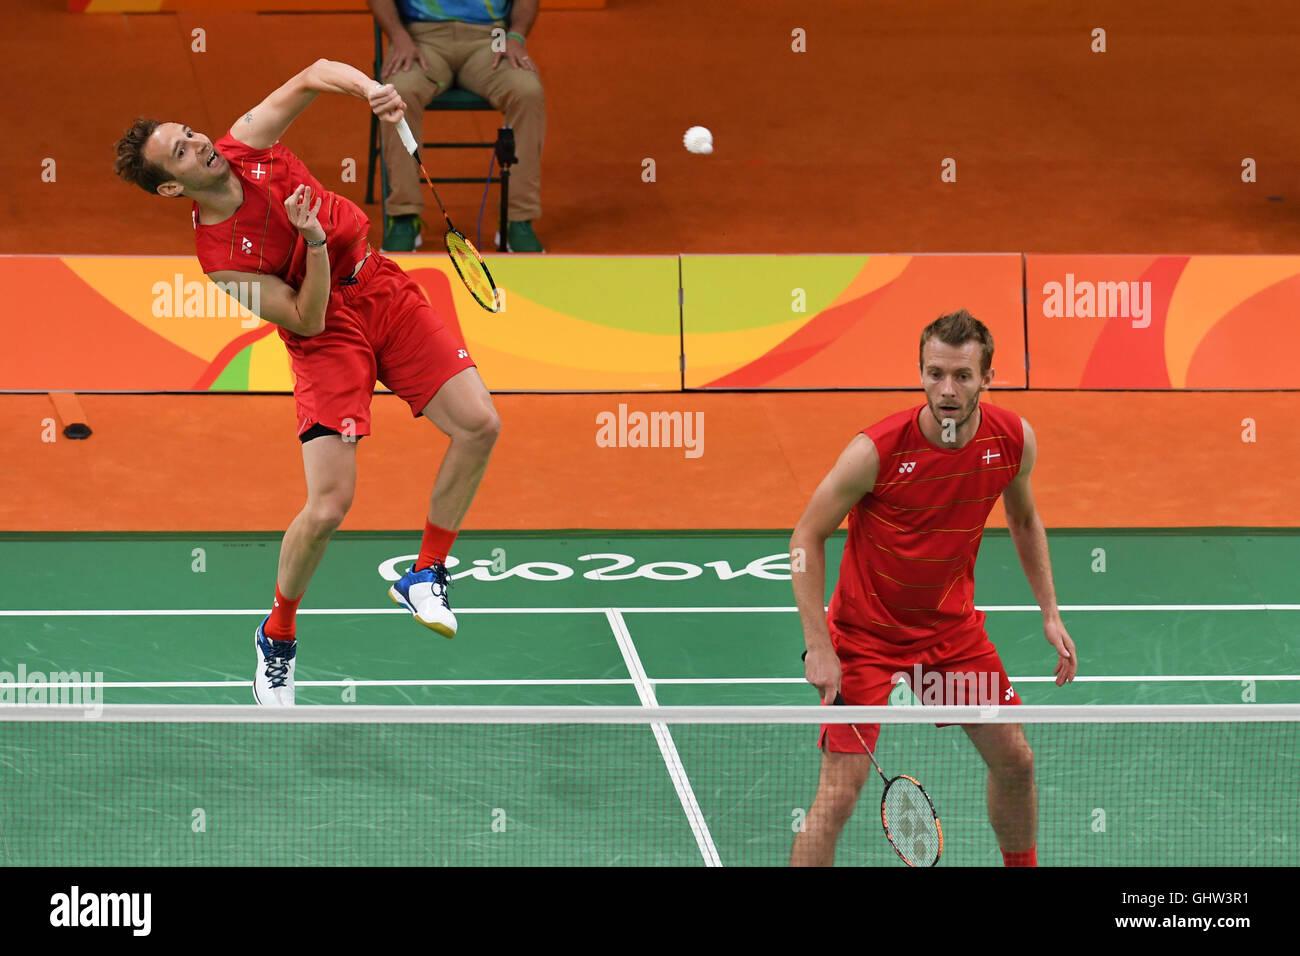 Rio de Janeiro Brazil 11th August 2016 Badminton Mathias BOE